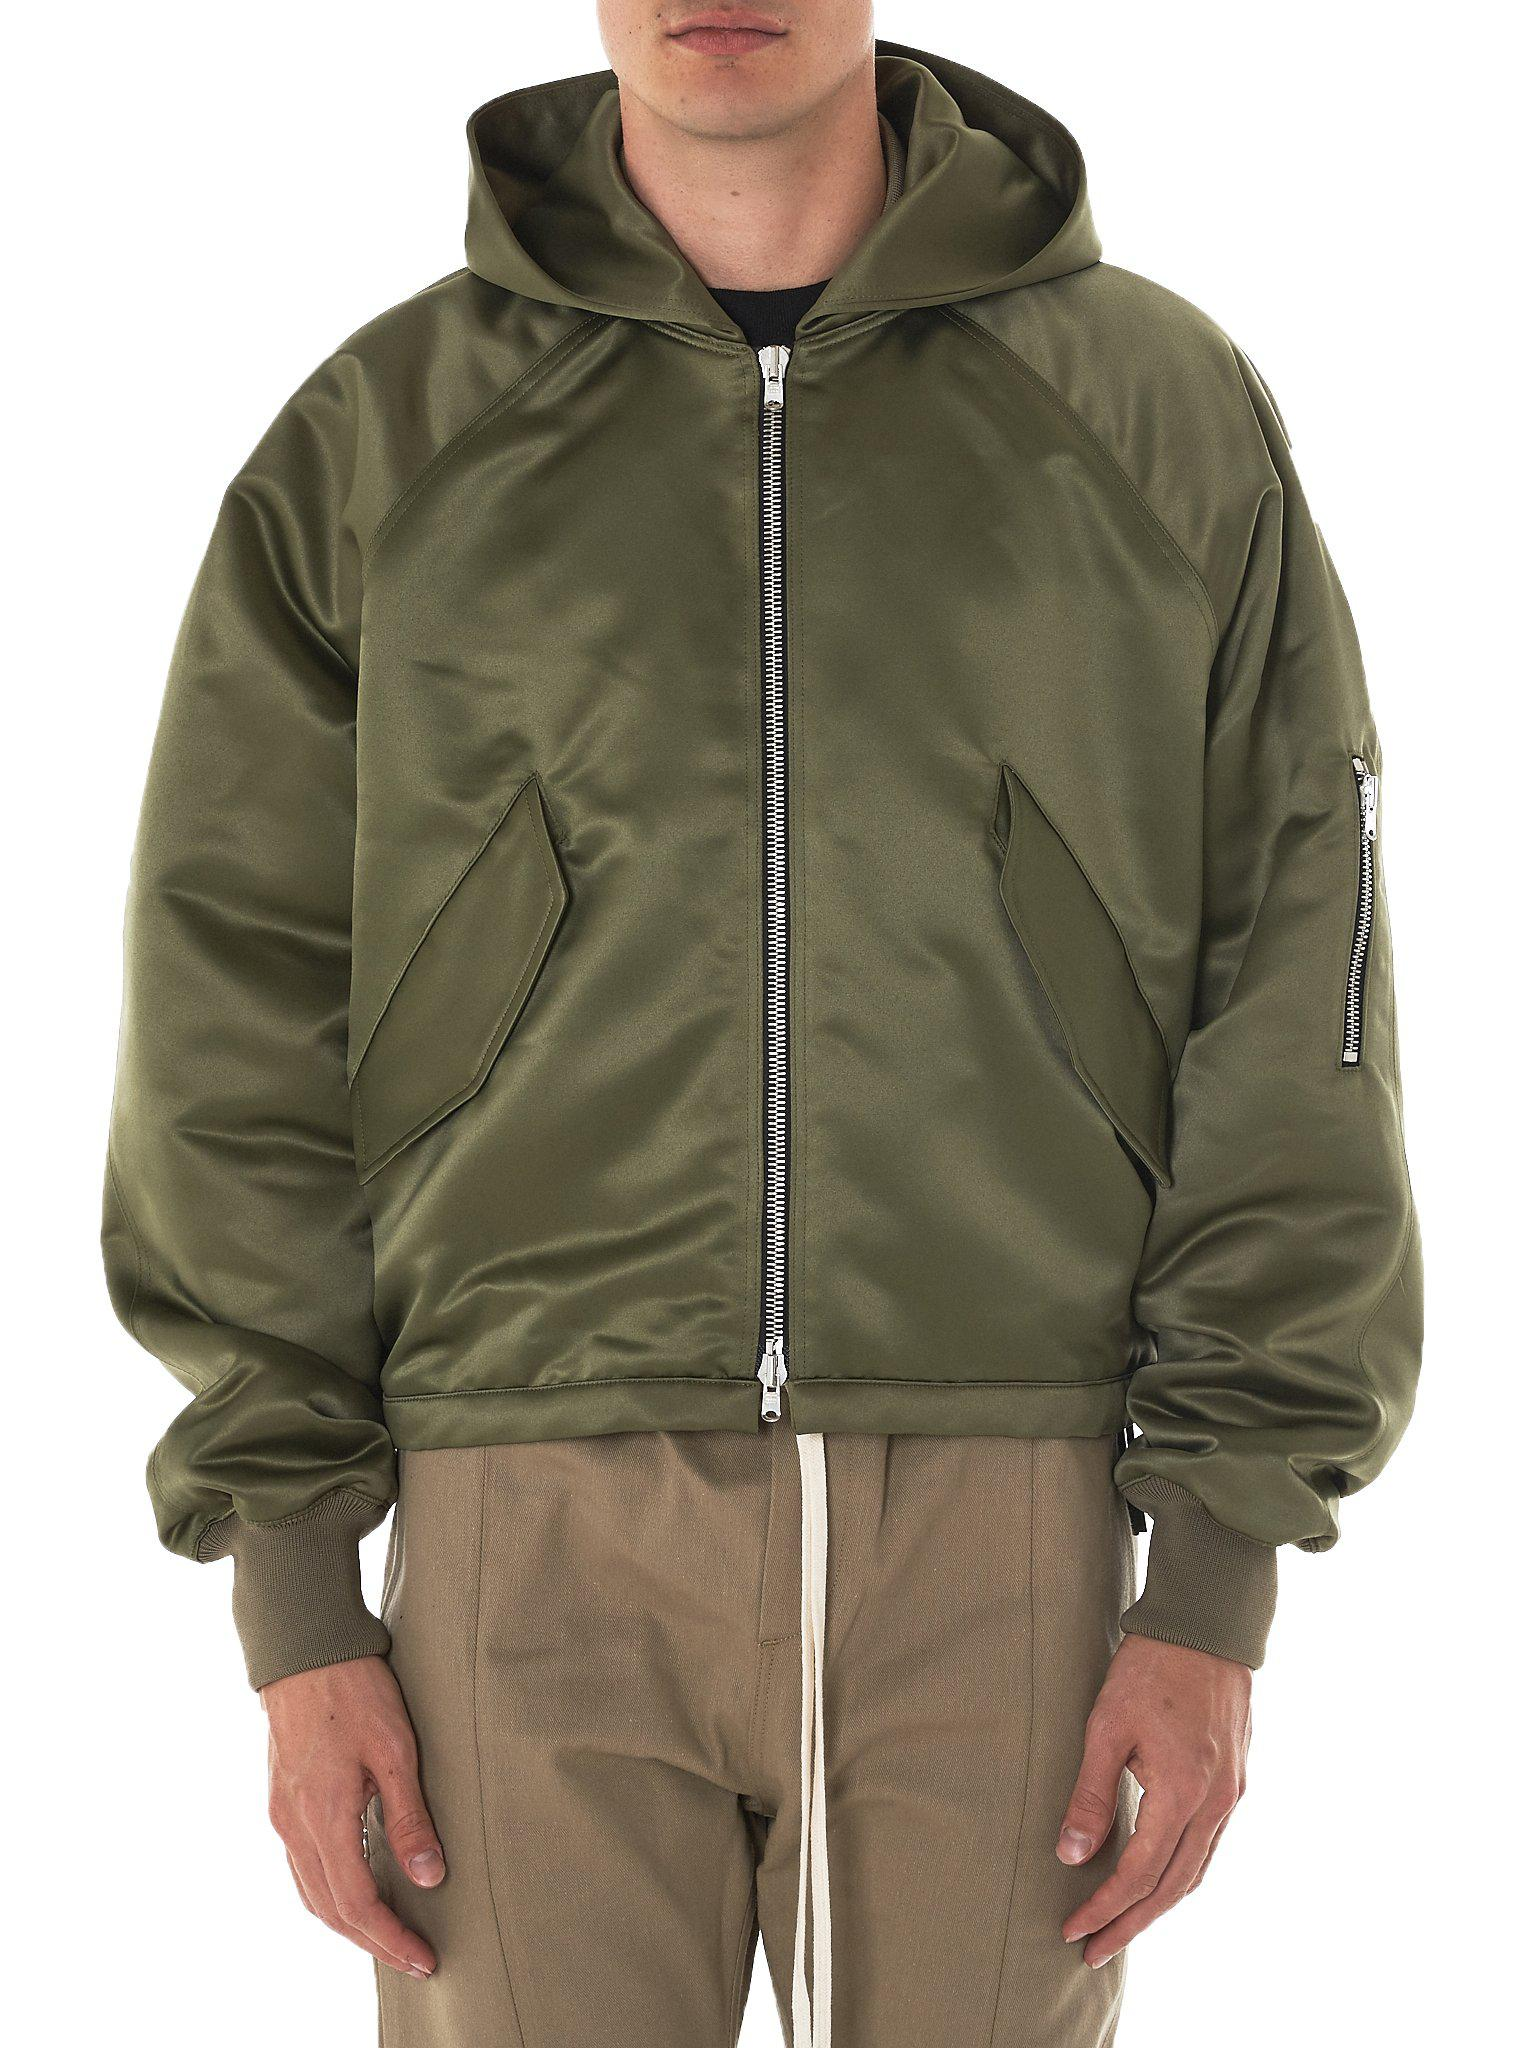 Lyst Fear Of God Hooded Satin Bomber Jacket In Green For Men